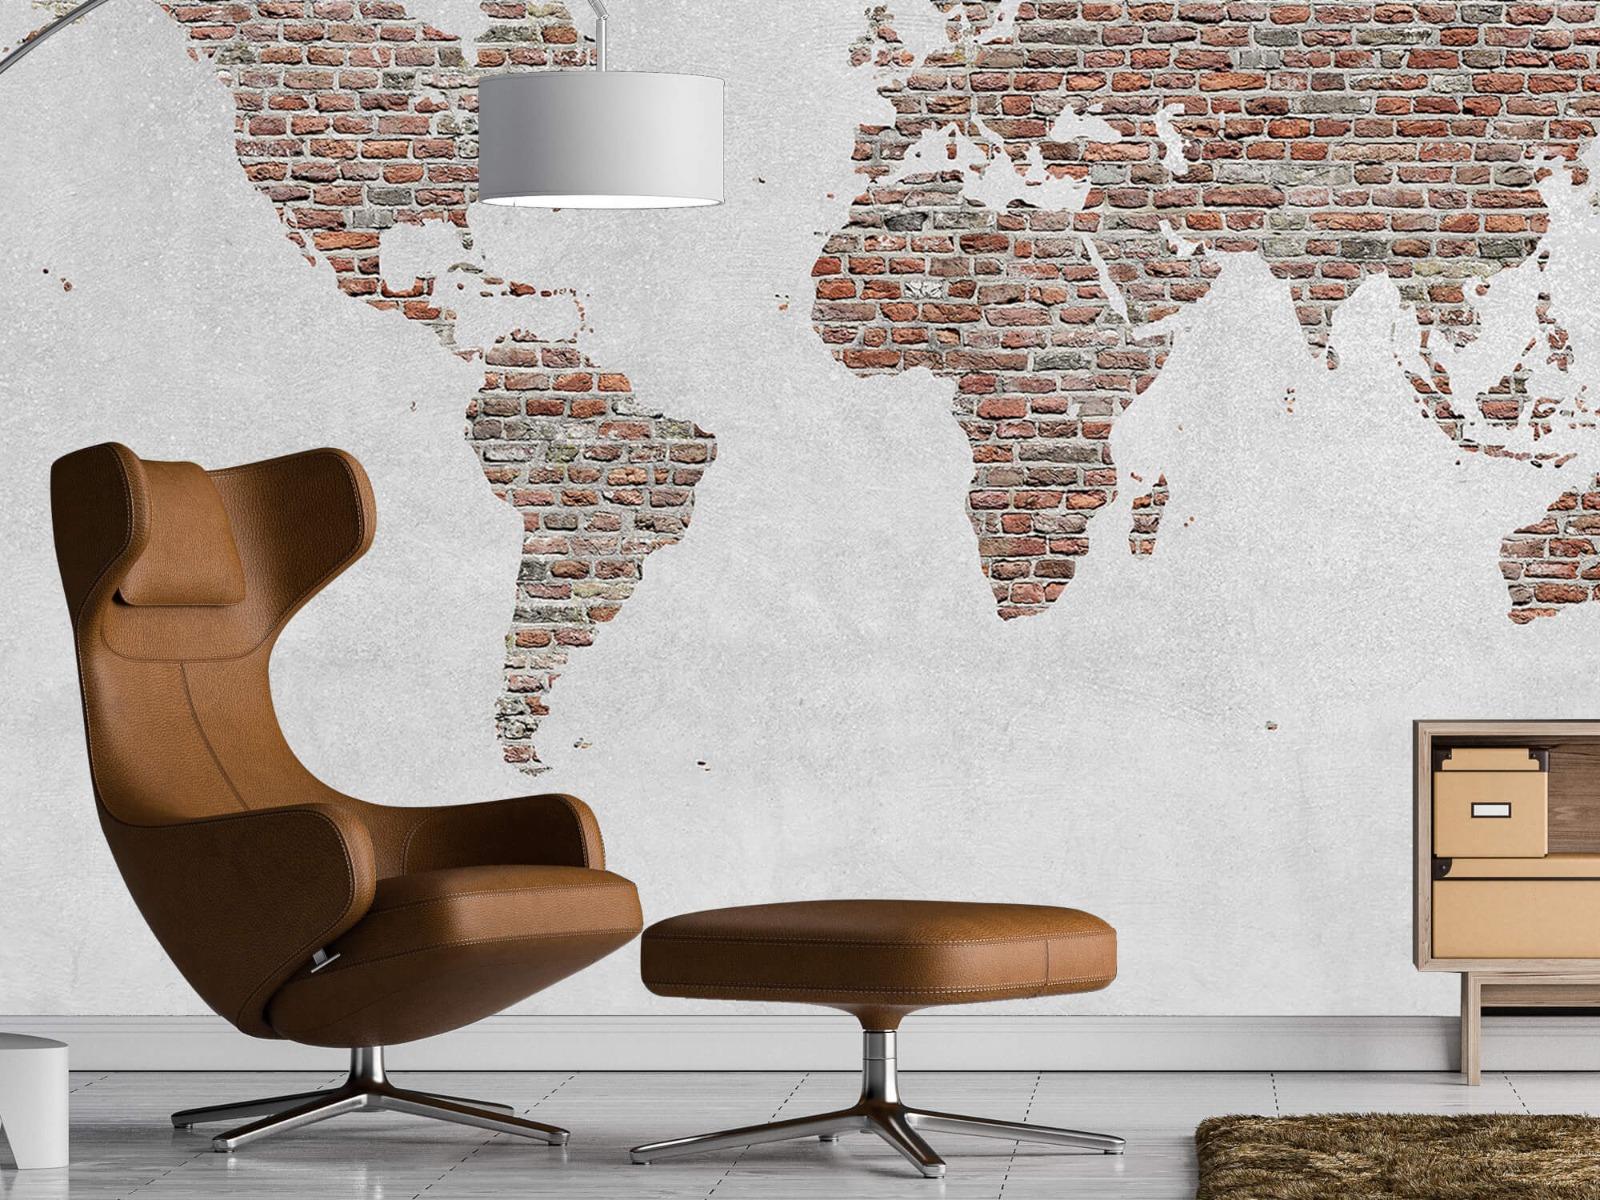 Steen behang - Wereldkaart stenen - Slaapkamer 19